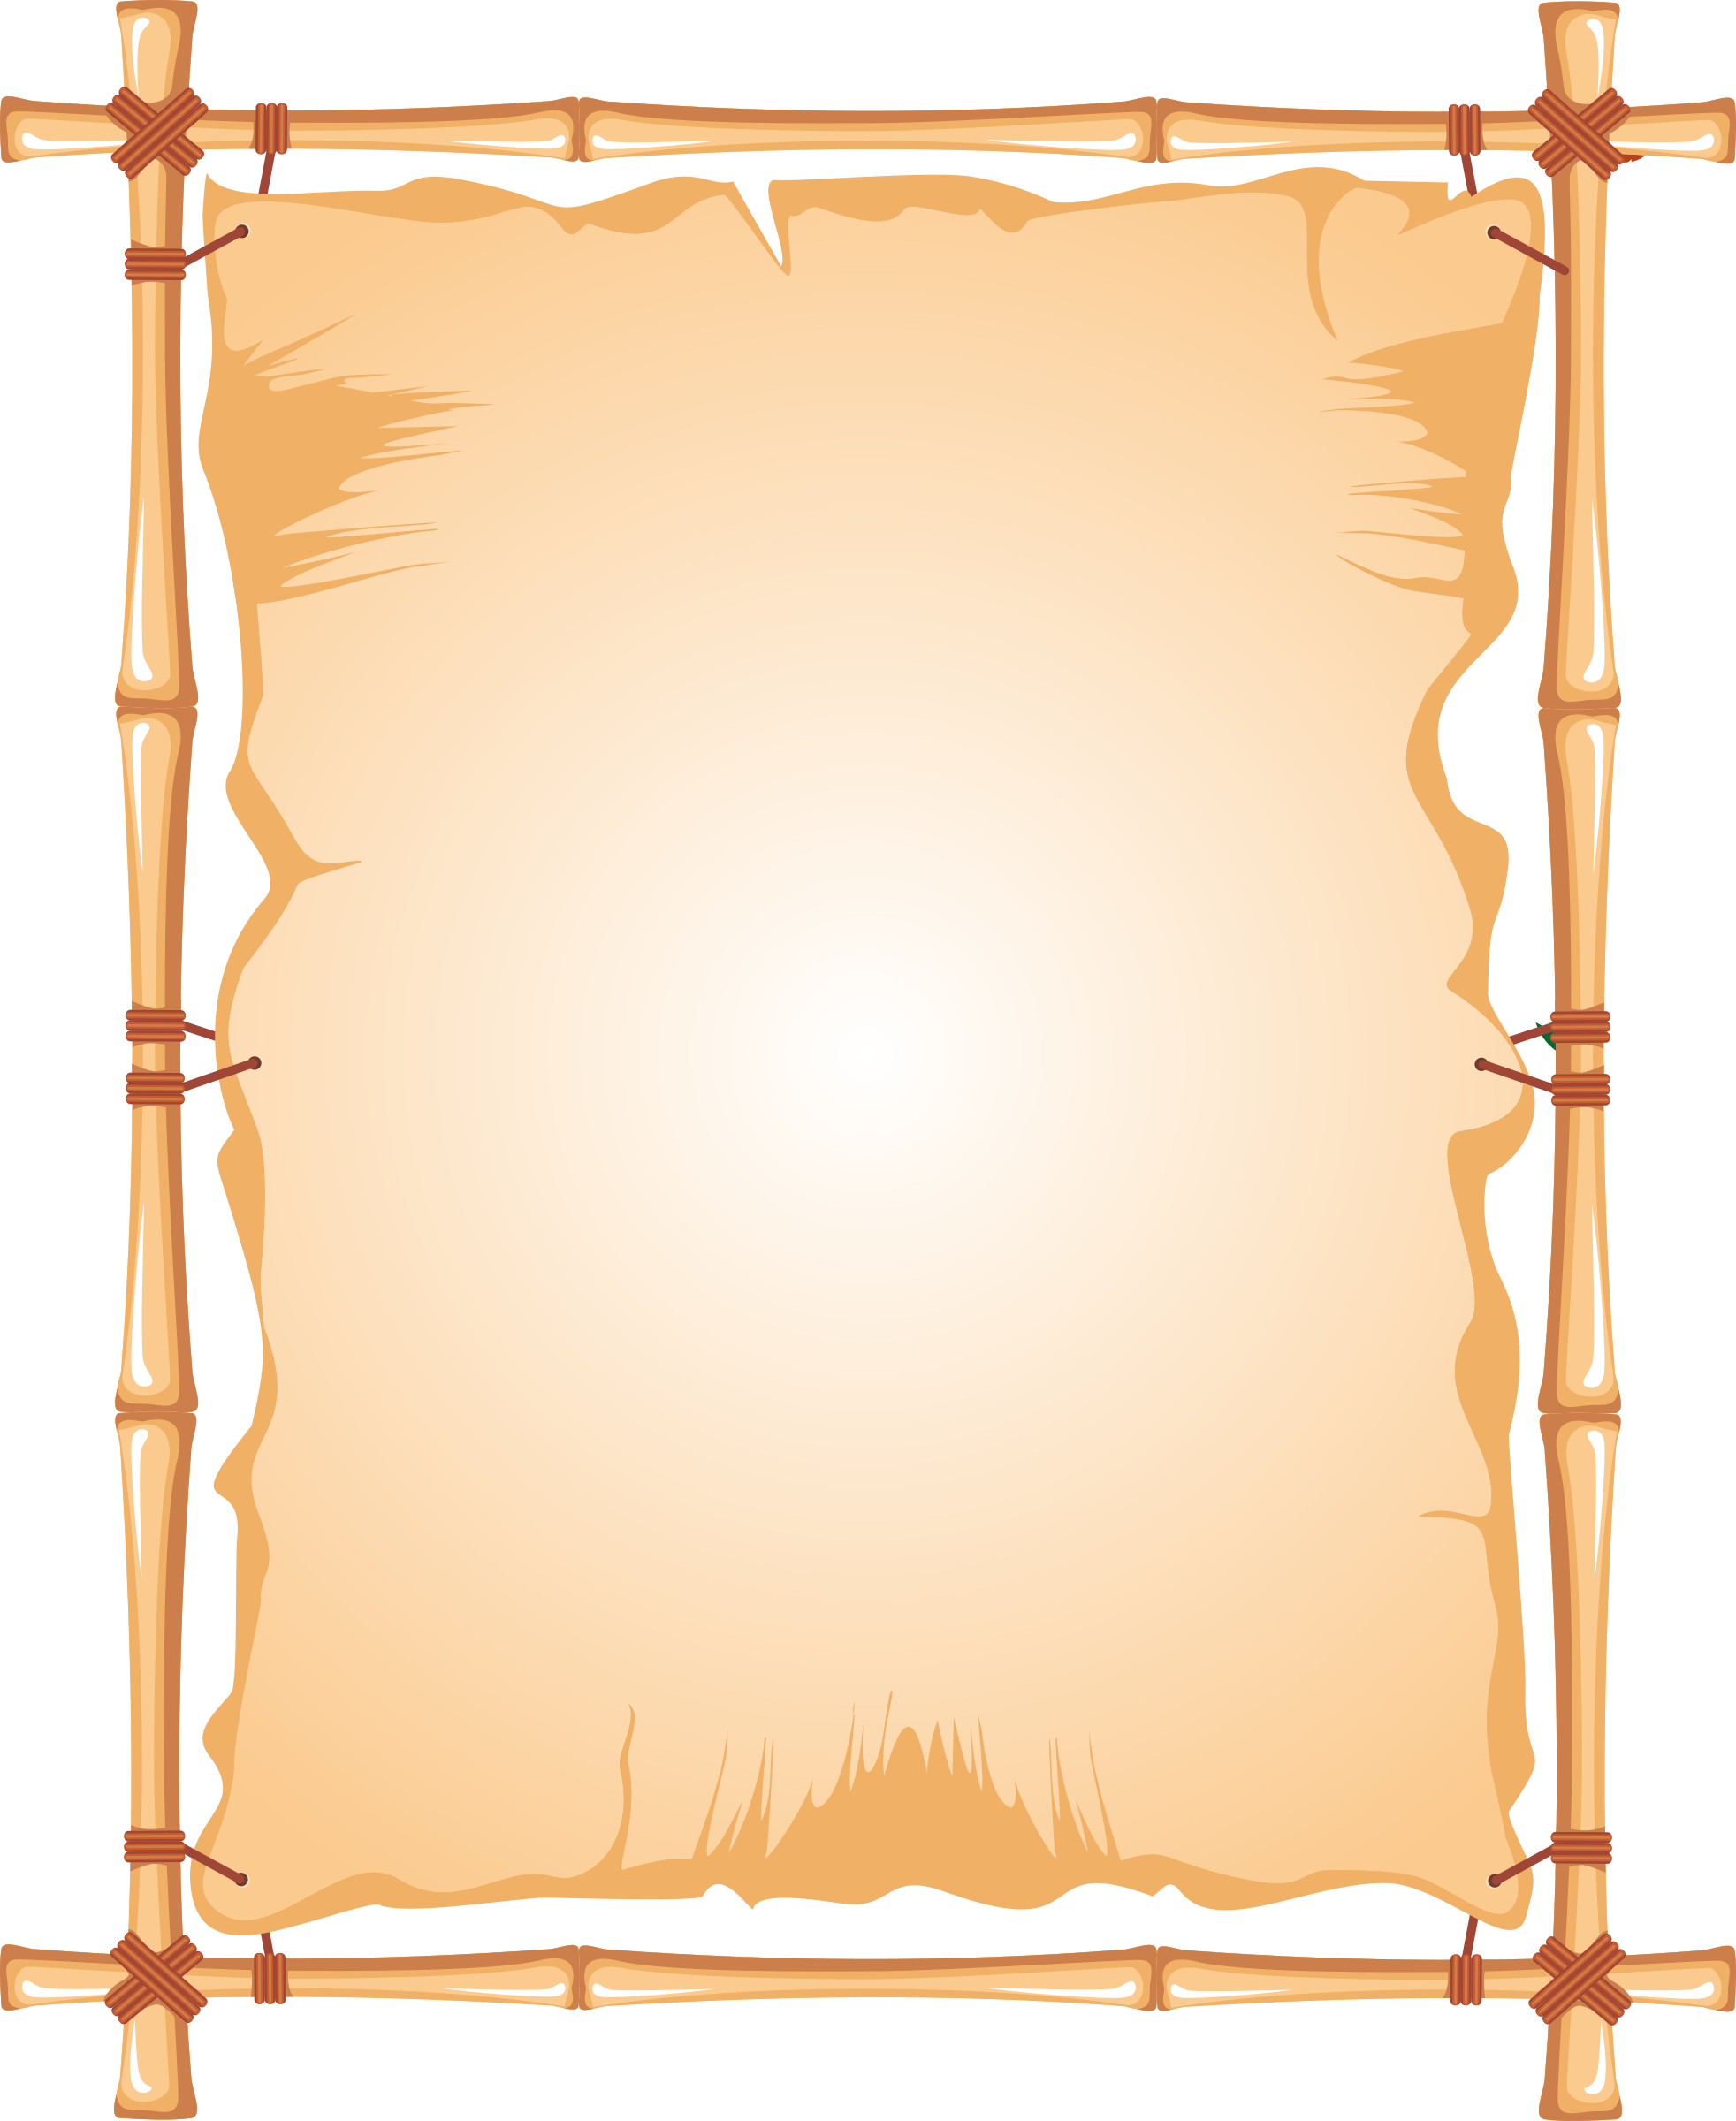 gold certificate border | bamboo frame by floedelmann | matrimonio ...